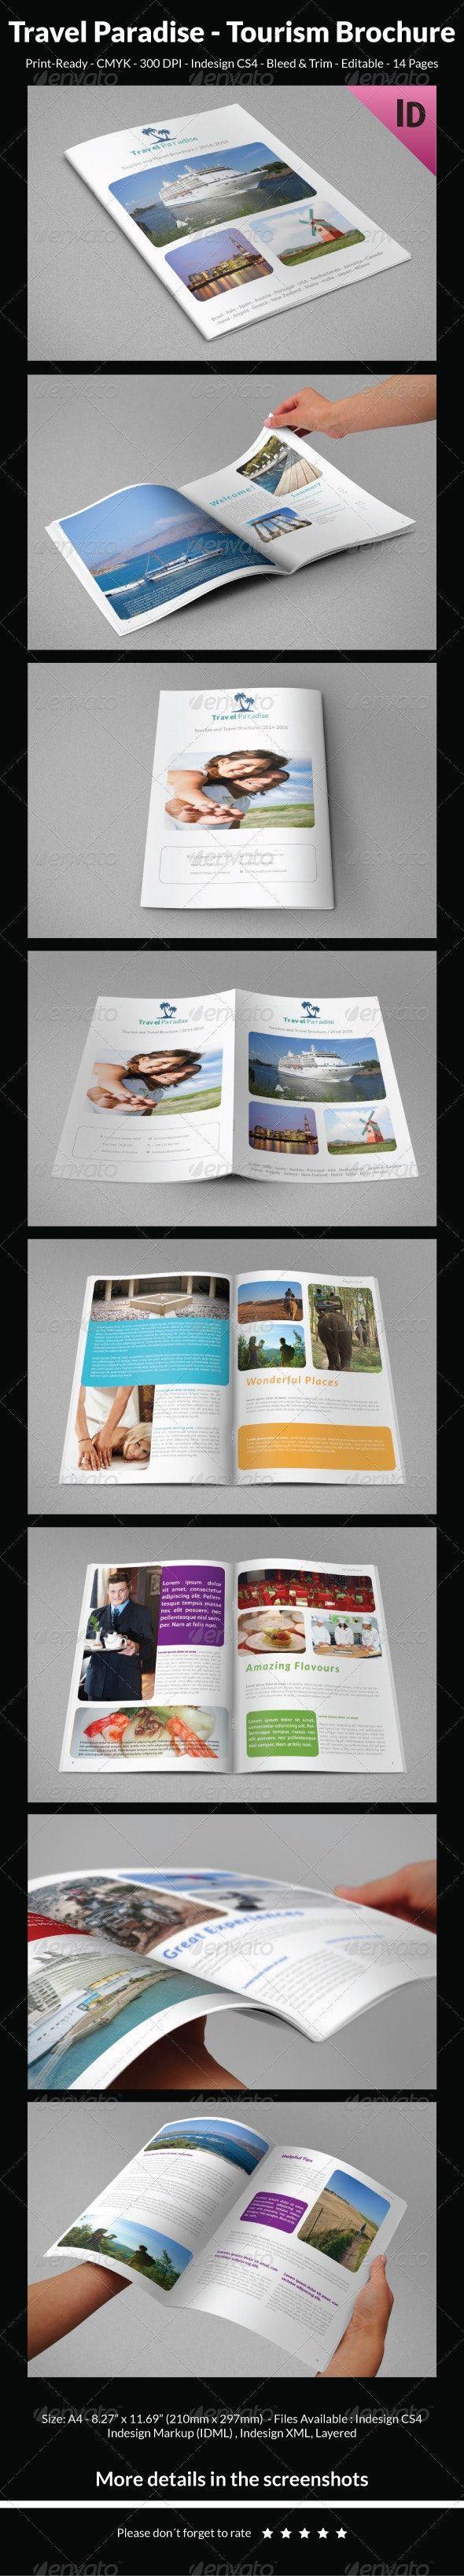 Travel Paradise - Tourism Brochure Travel Paradise - Tourism Brochure Tourism a tourism brochure